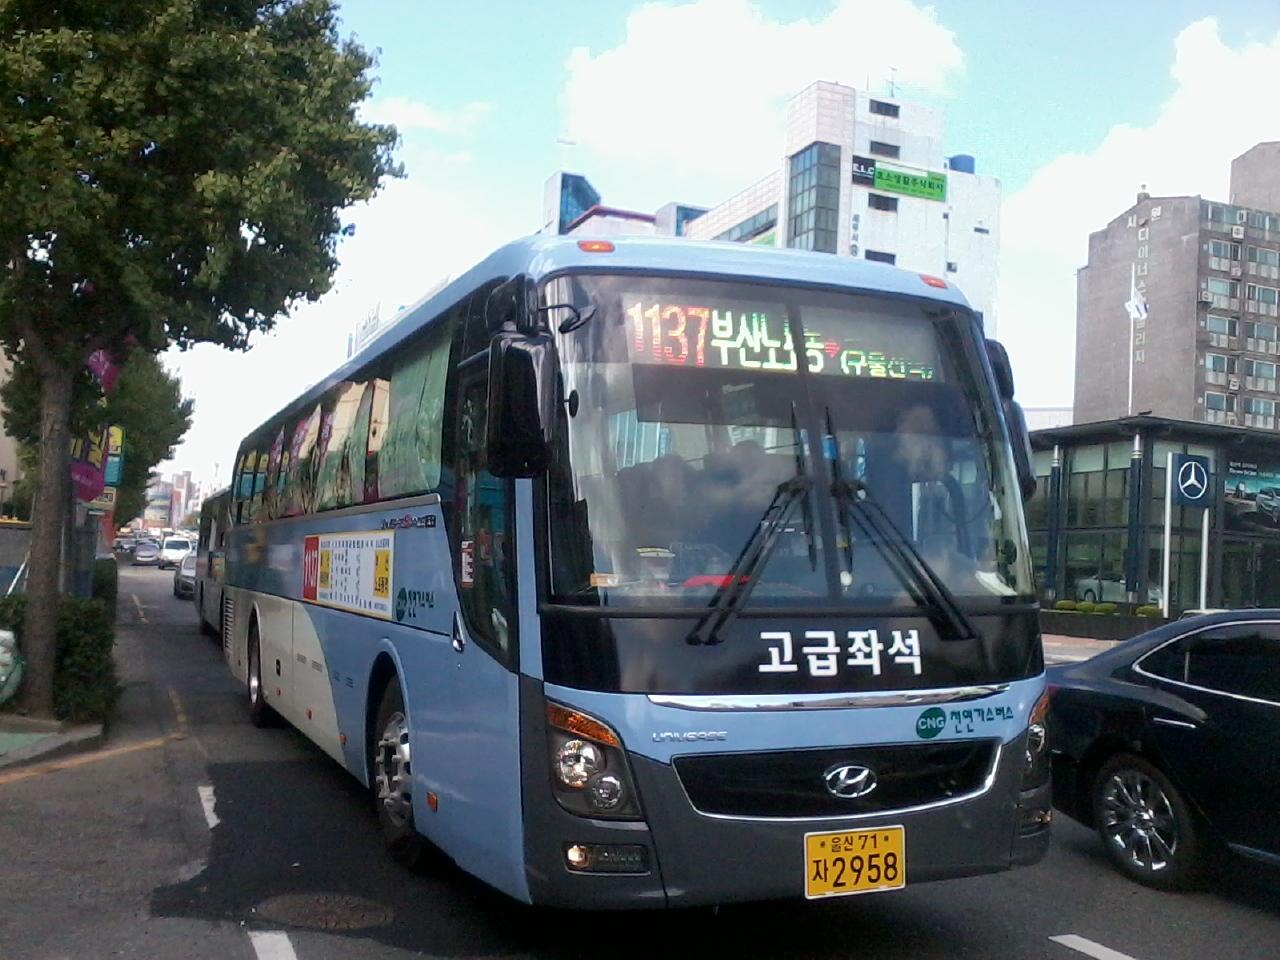 File:Ulsan Bus 1137 (Advanced Seat) - Hakseong Bus.jpg